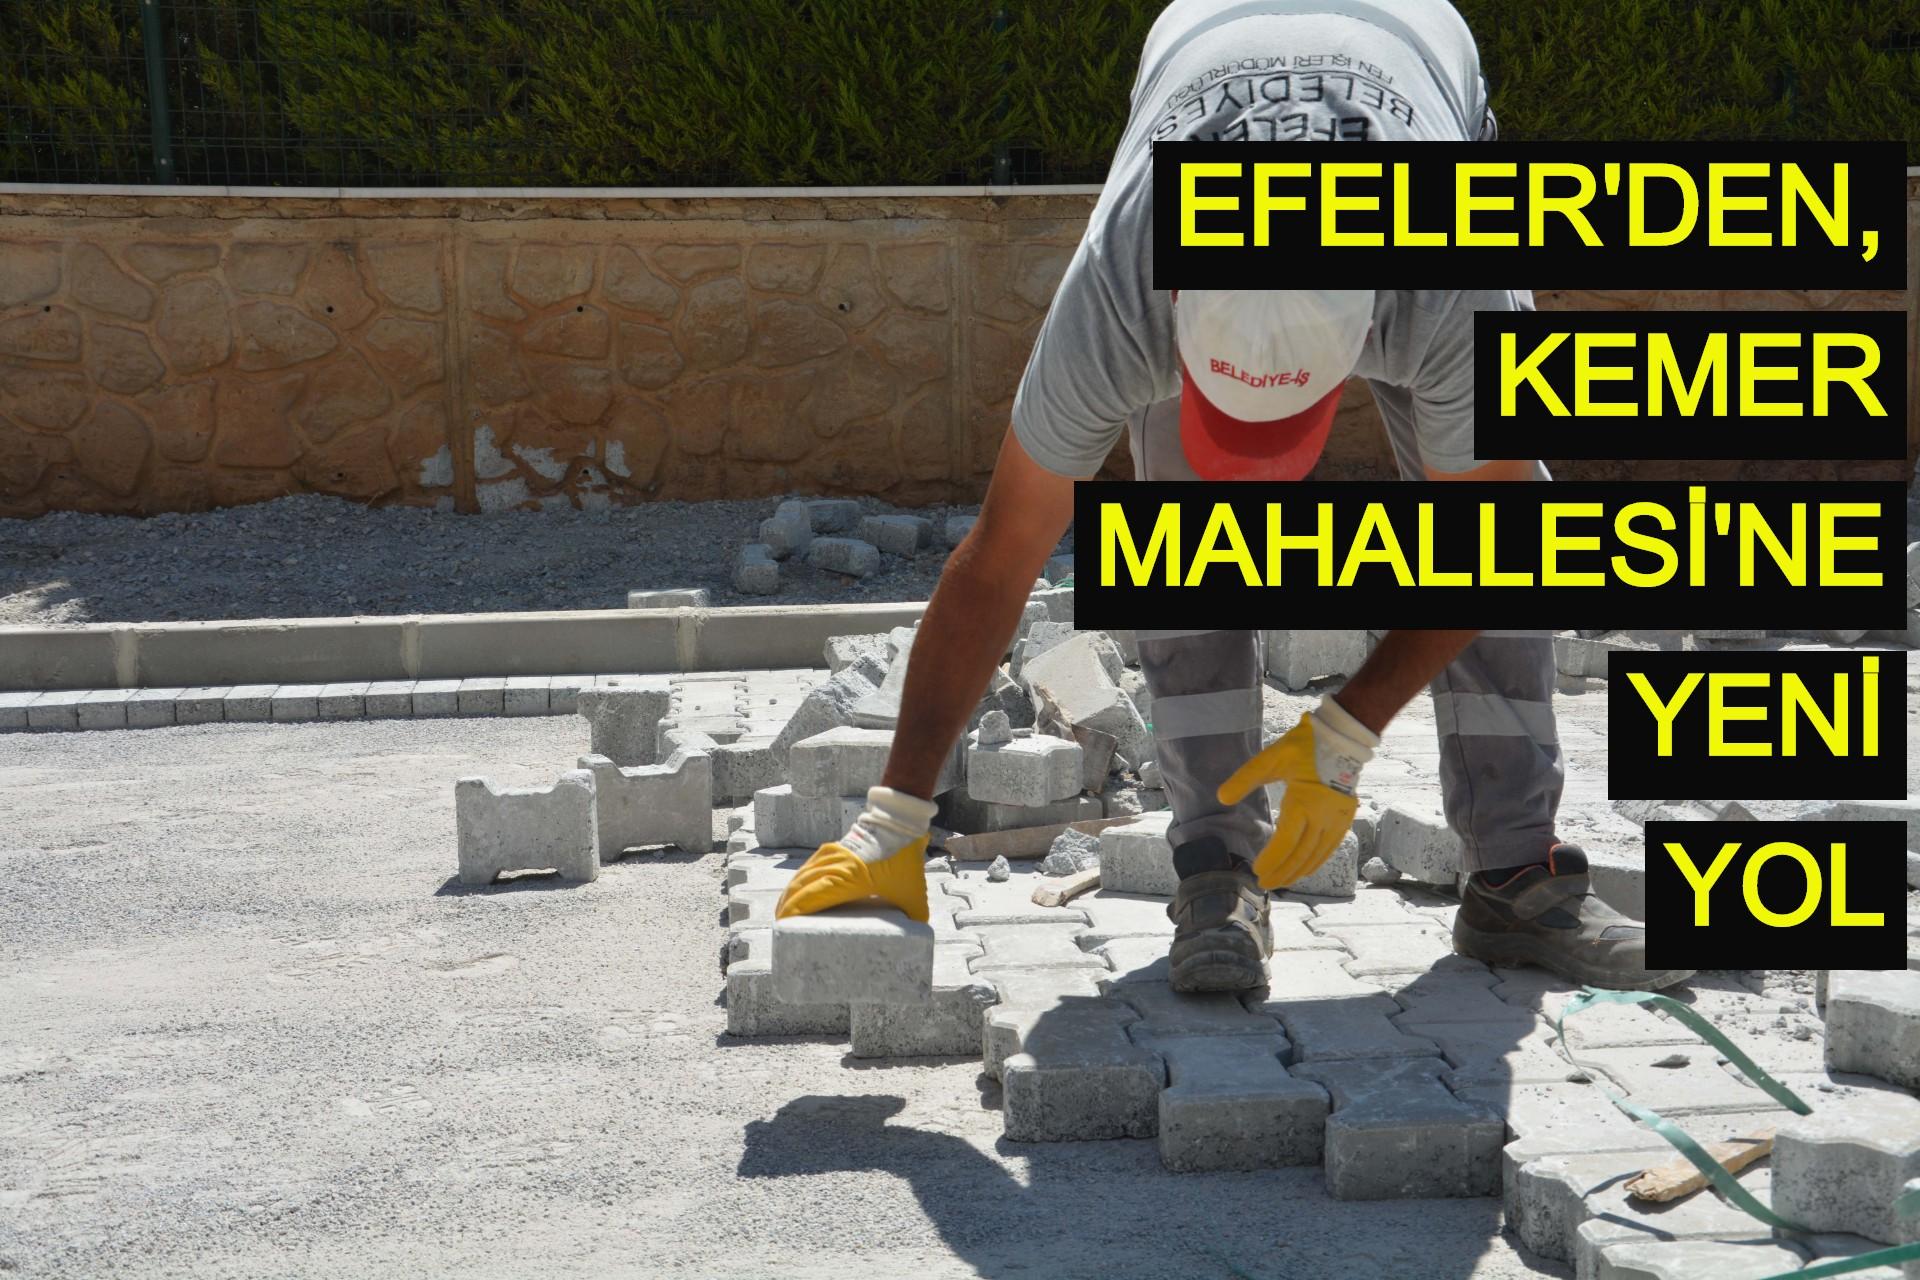 Efeler'den, Kemer Mahallesi'ne yeni yol